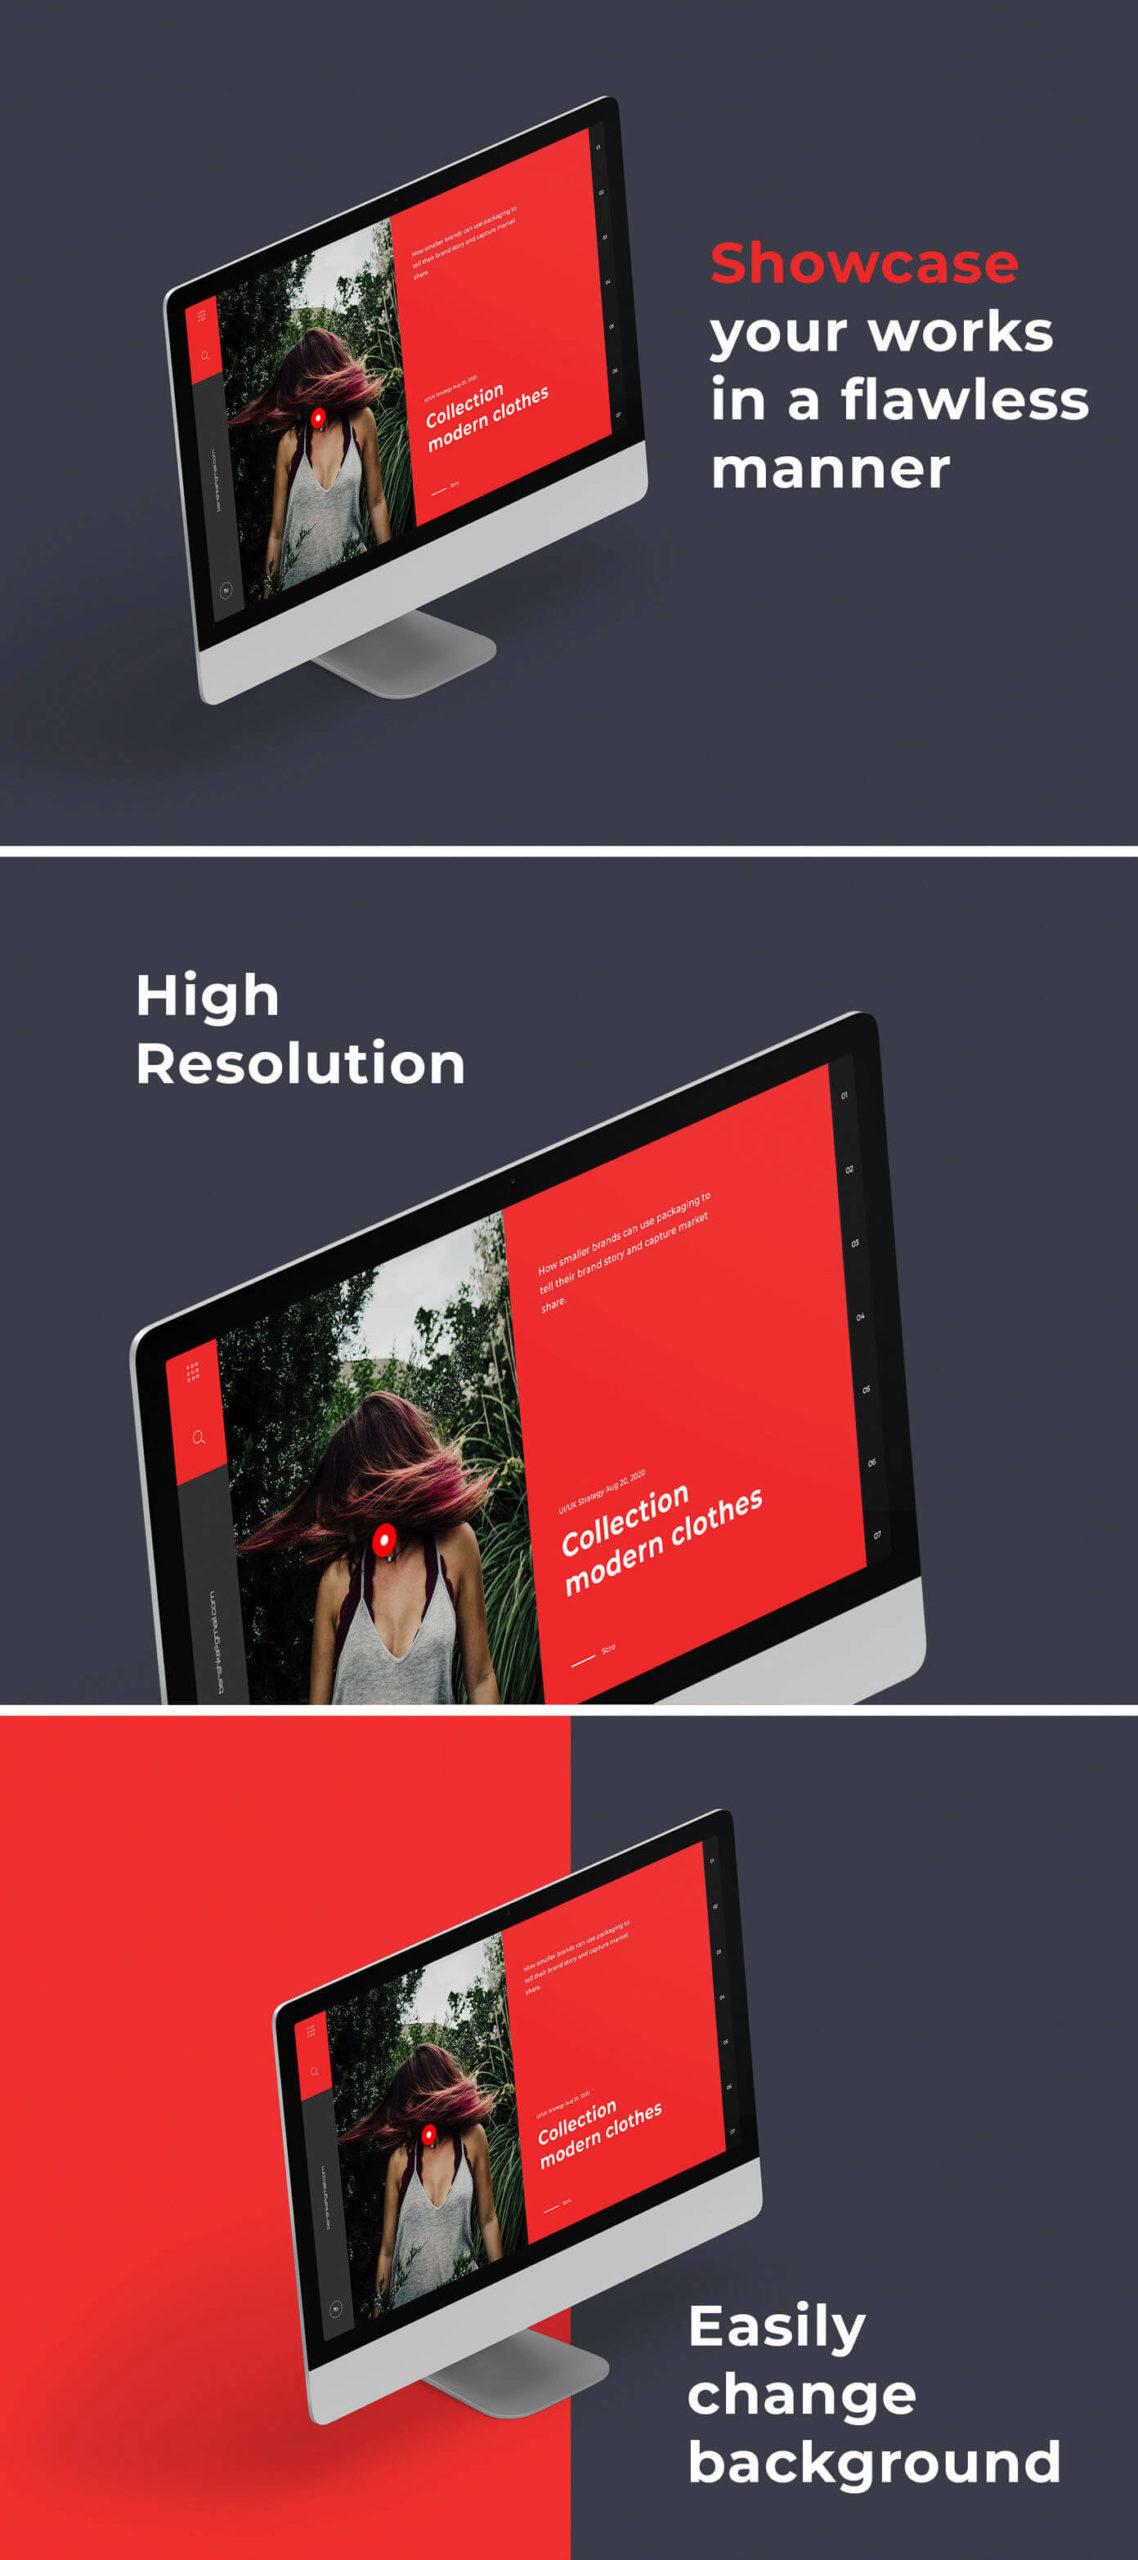 Free iMac Perspective Mockup PSD Template2